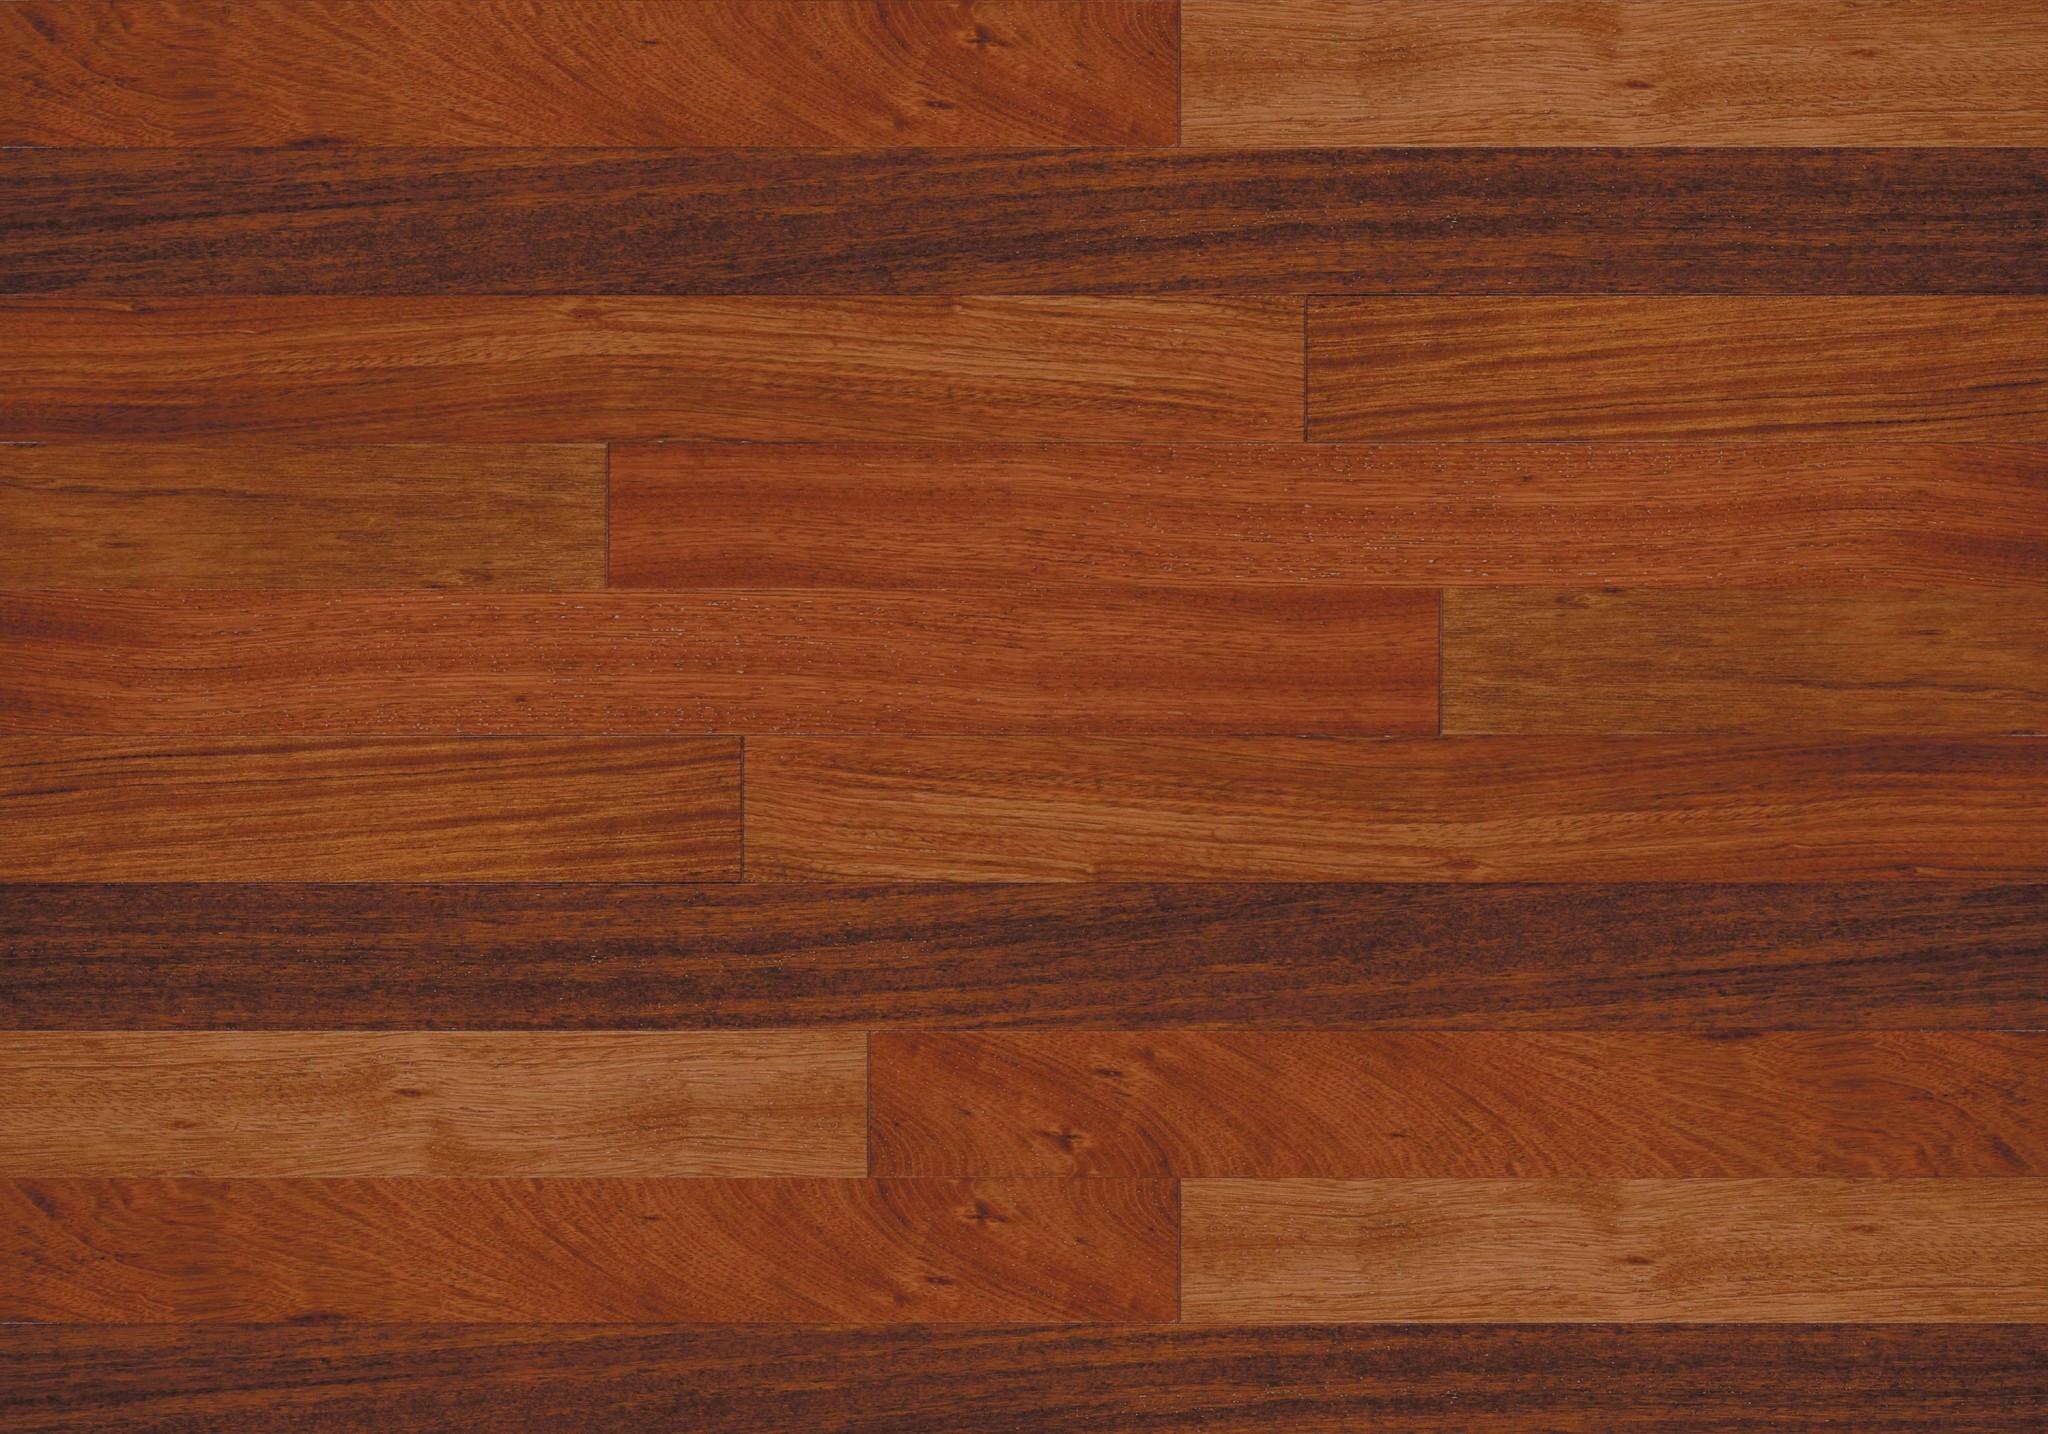 lauzon hardwood flooring distributors of natural designer brazilian cherry select better lauzon pertaining to african sapele hardwood flooring brown international natural designer lauzon